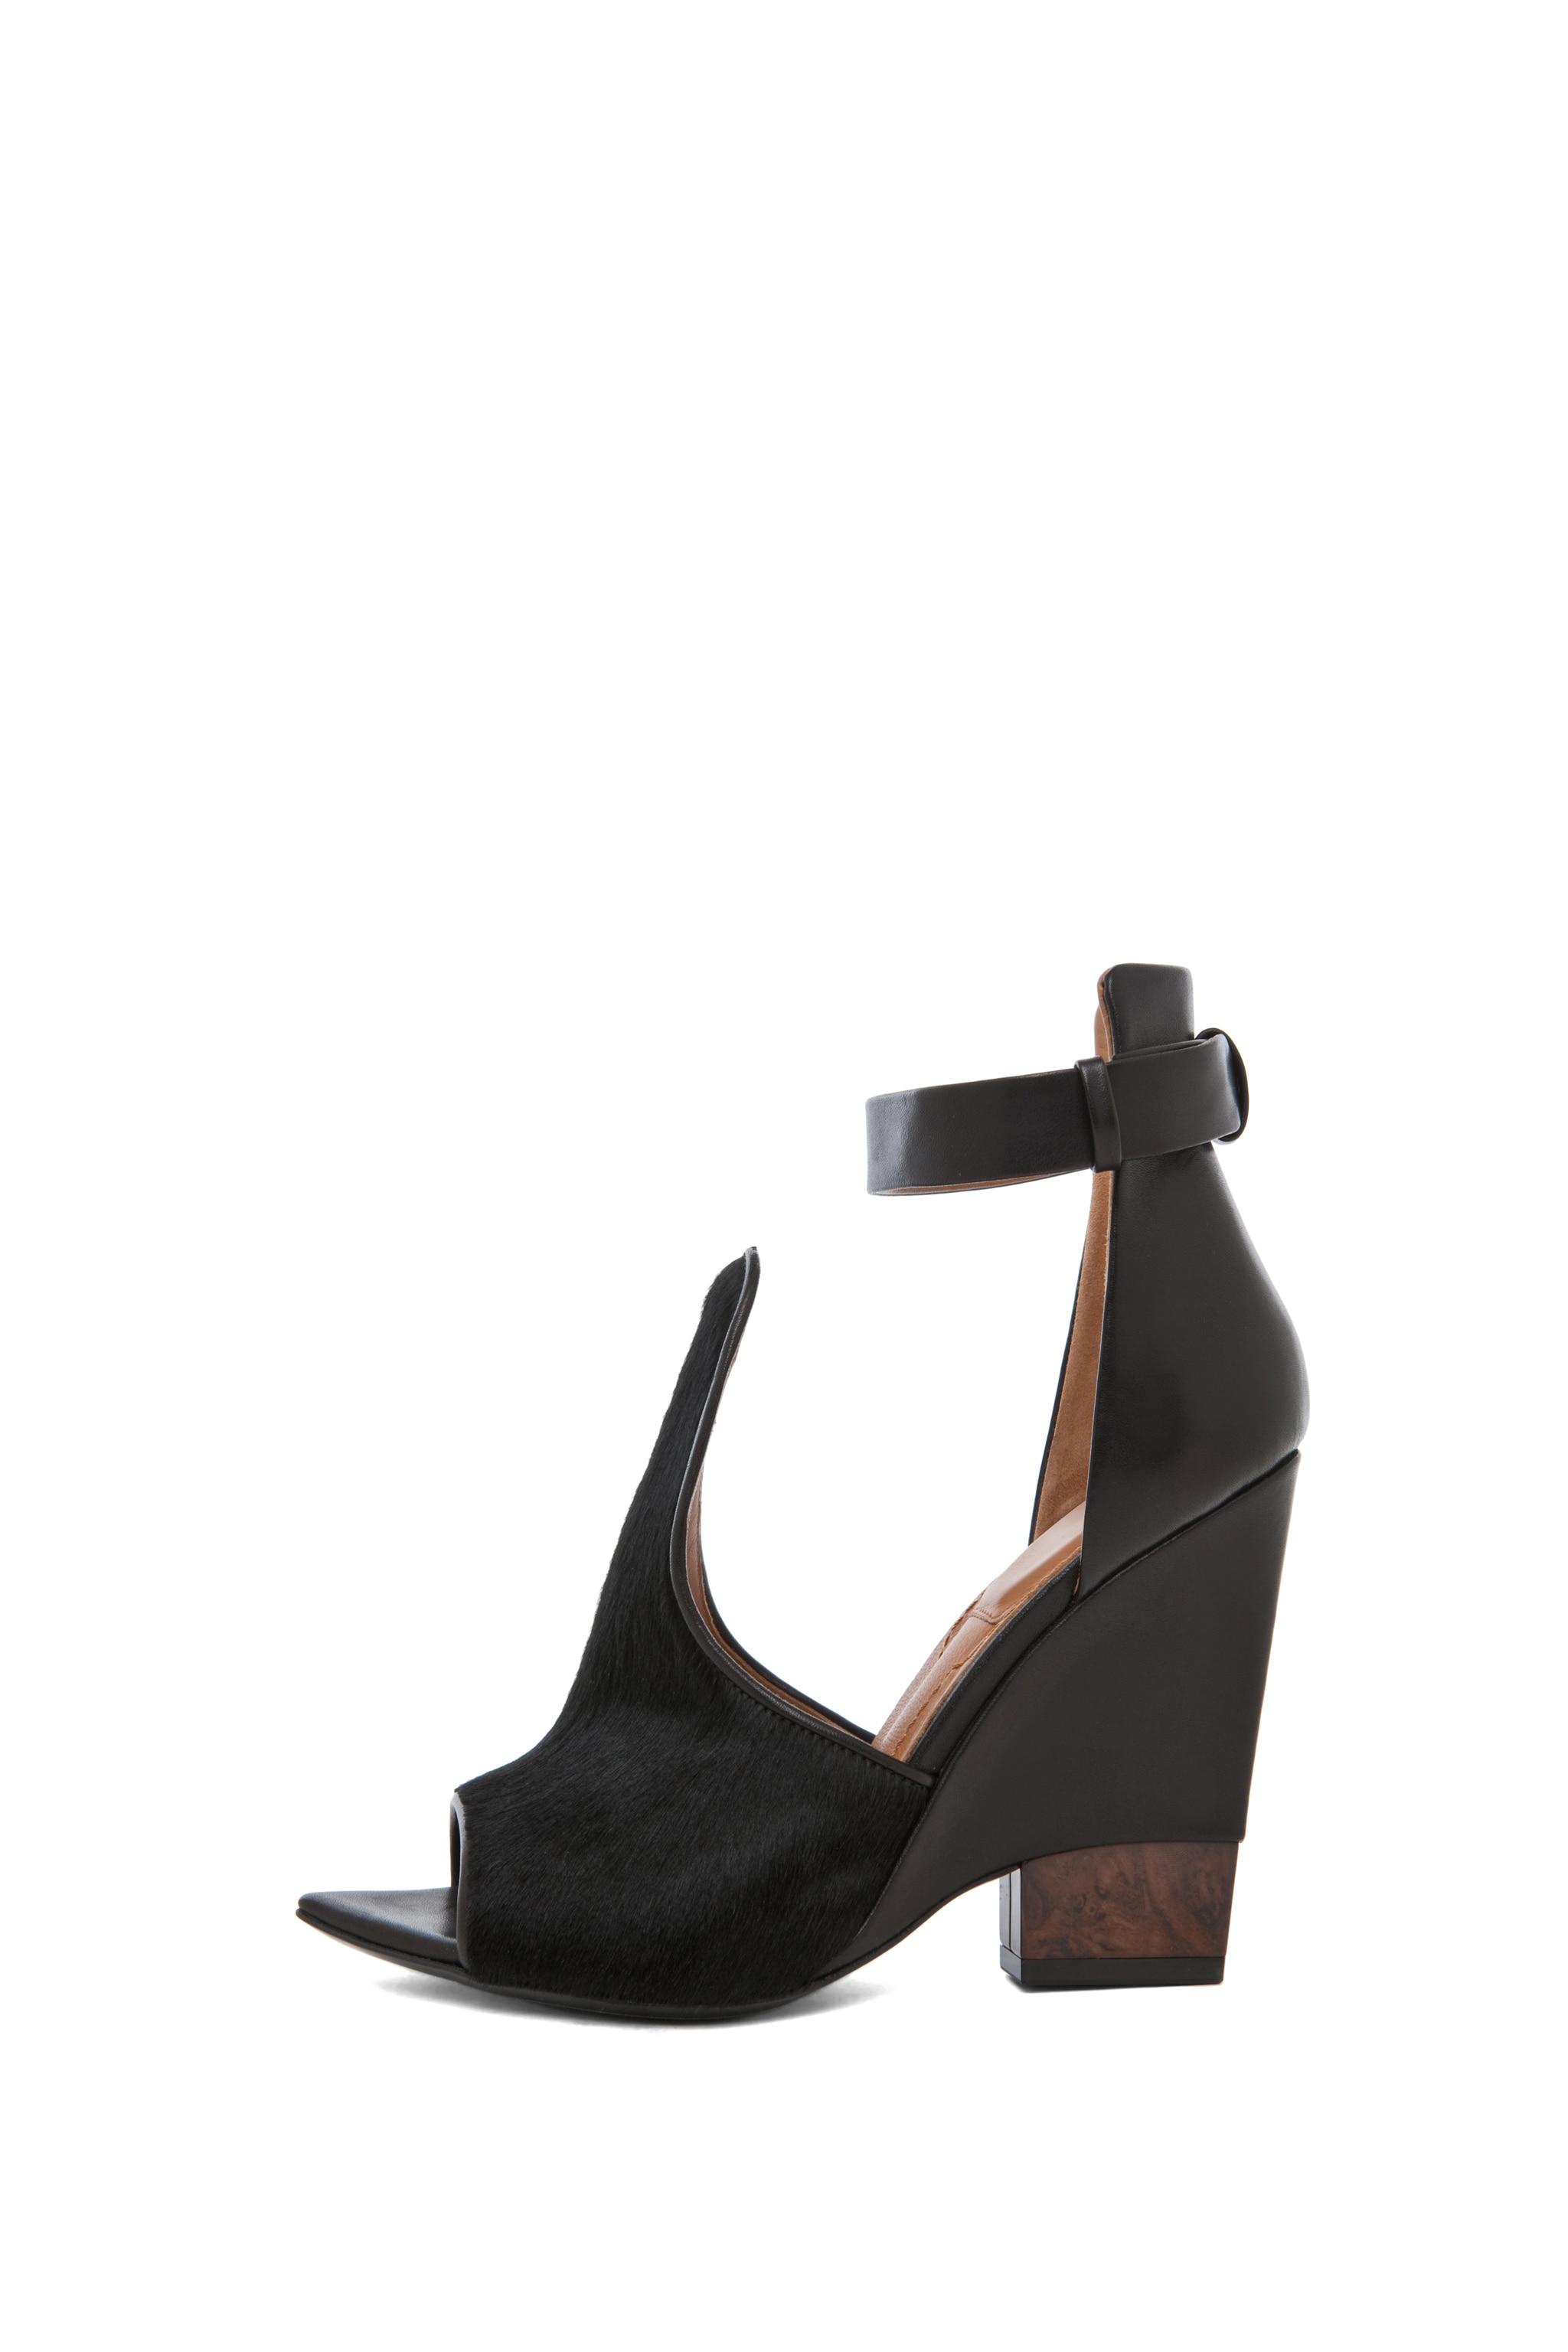 Image 1 of GIVENCHY Podium Ankle Strap Sandal in Black